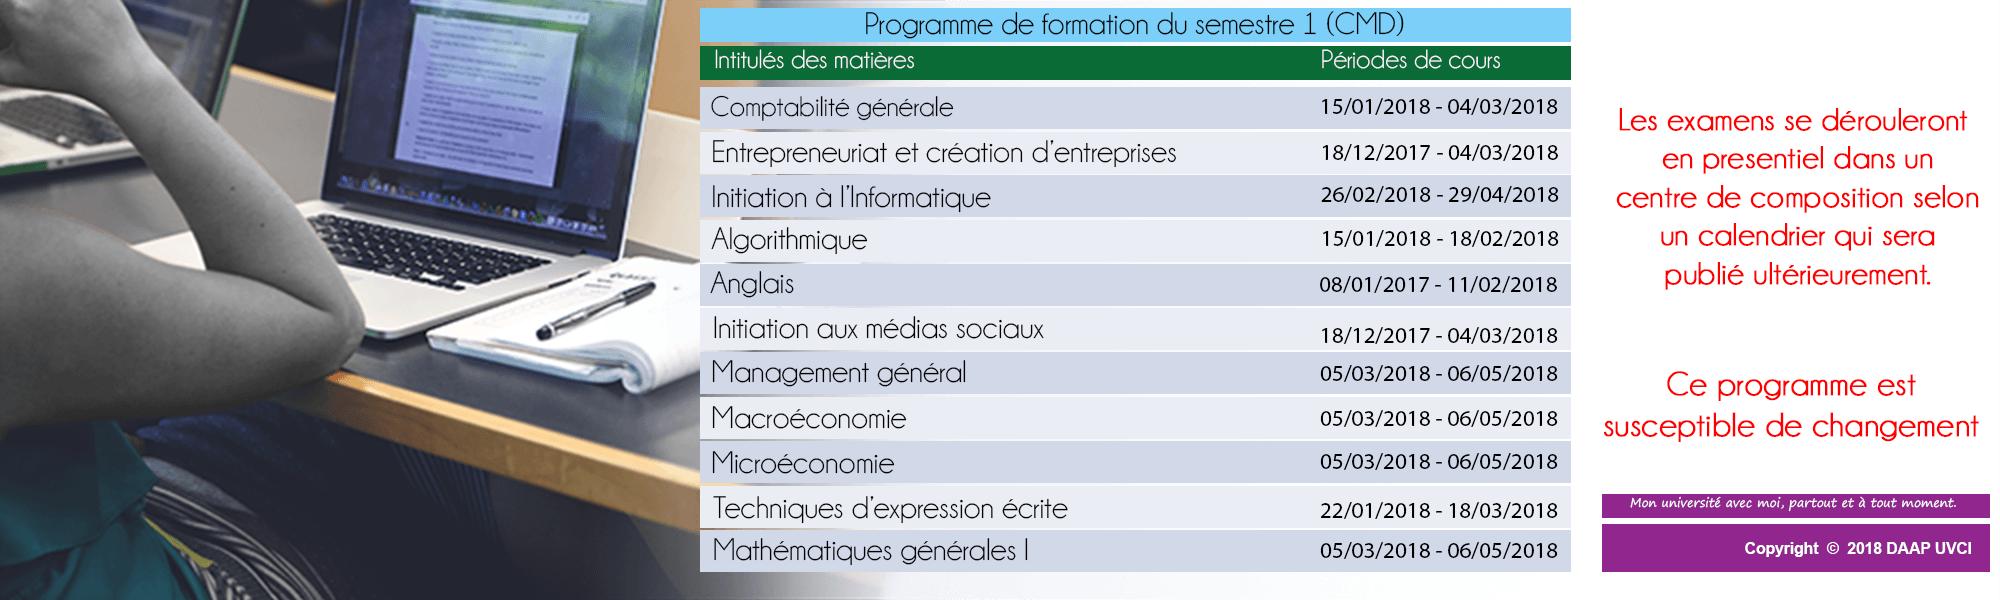 PROGRAMME DE FORMATION DU SEMESTRE 1 - CMD